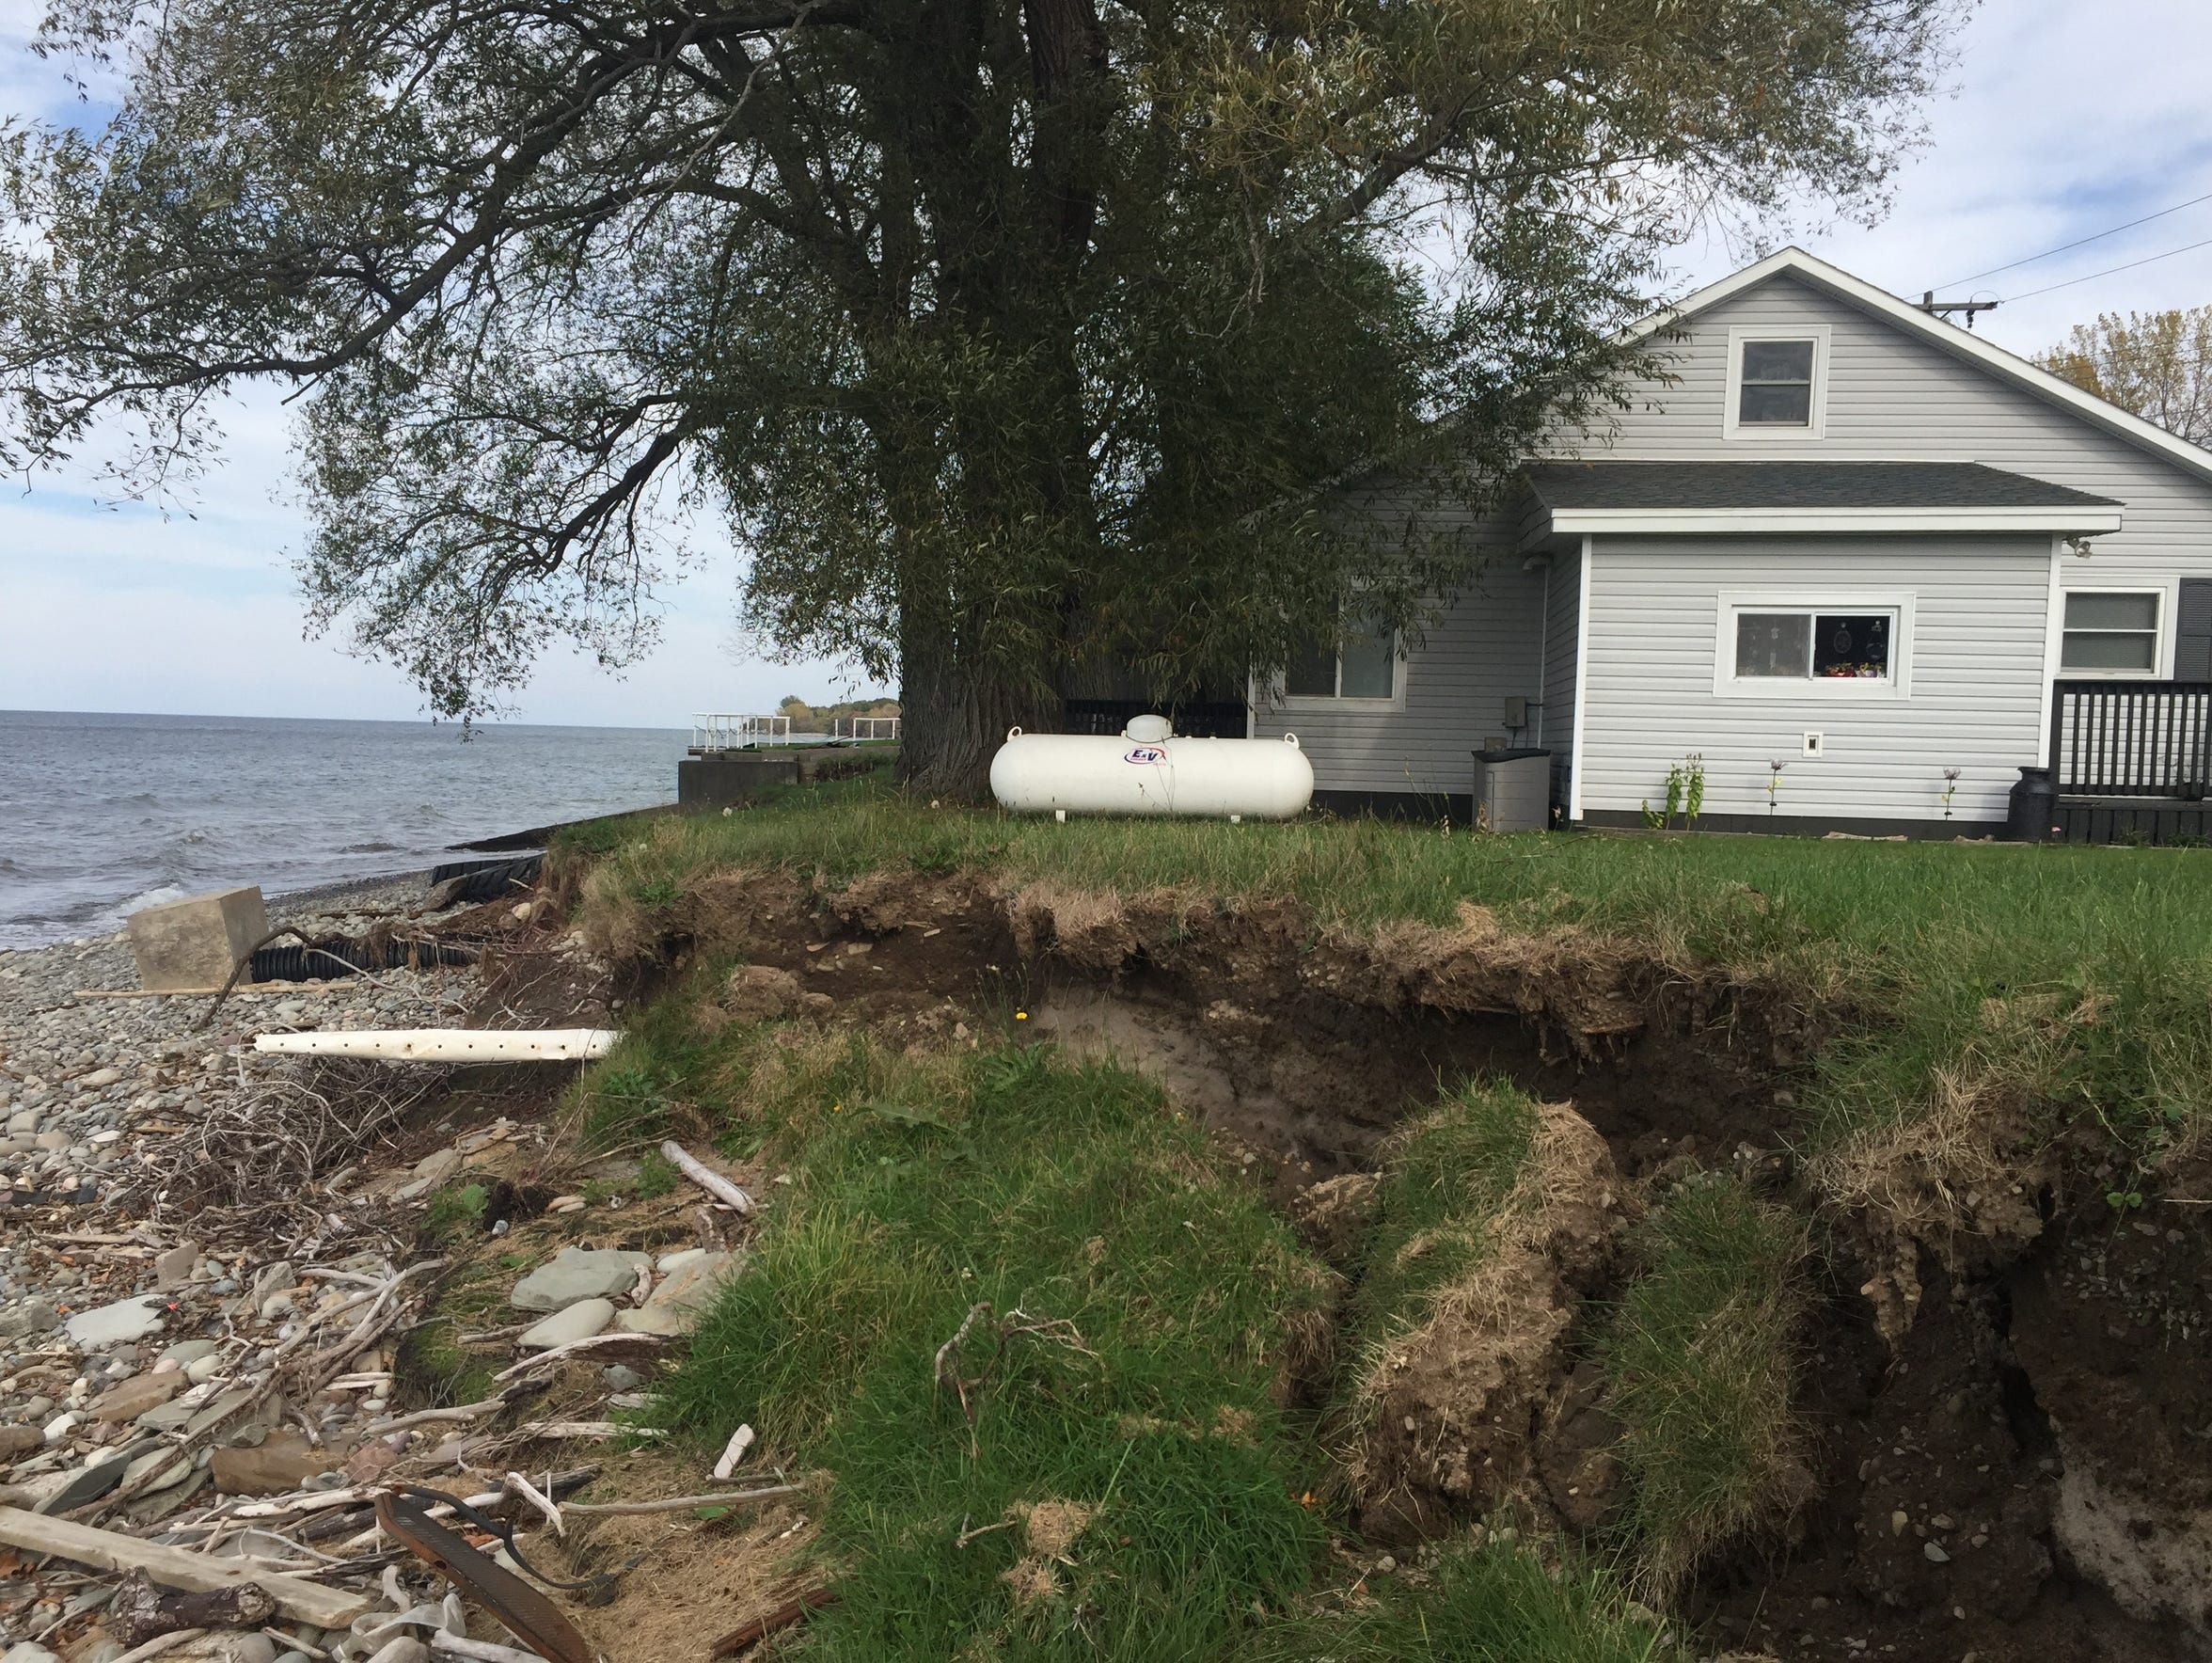 Erosion at Carolyn Noels home in Oswego